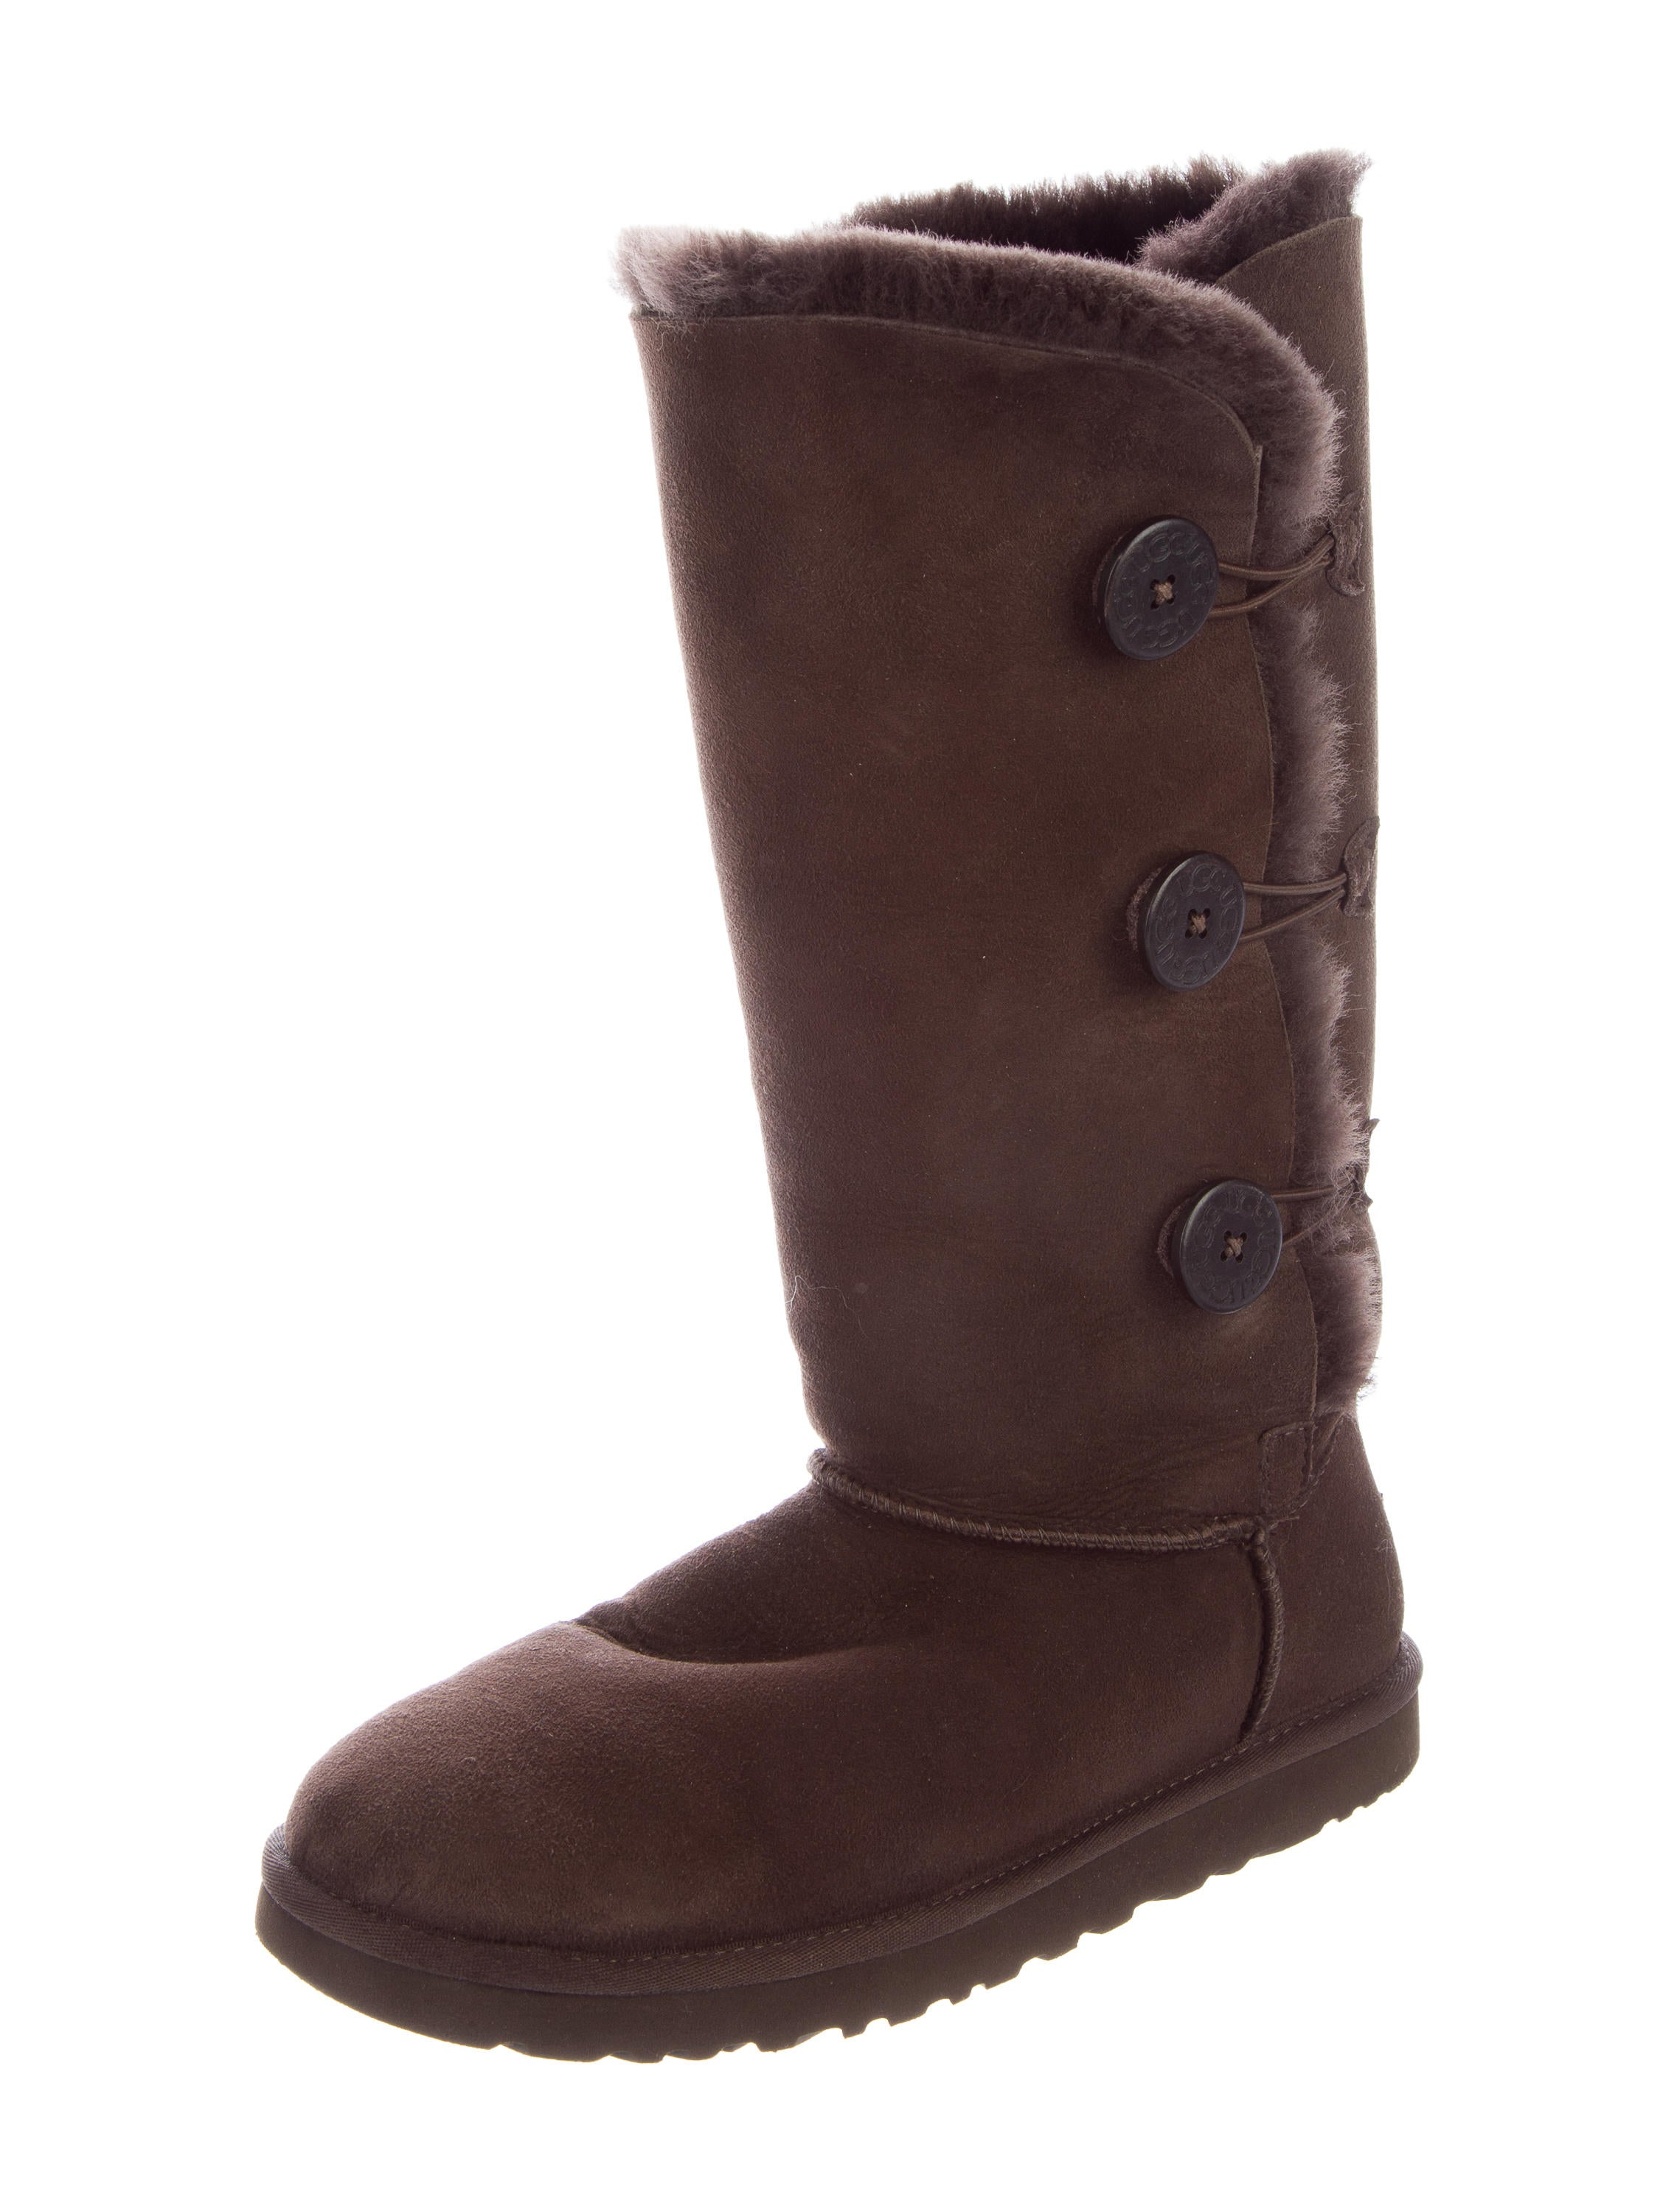 australian ugg boots bailey button